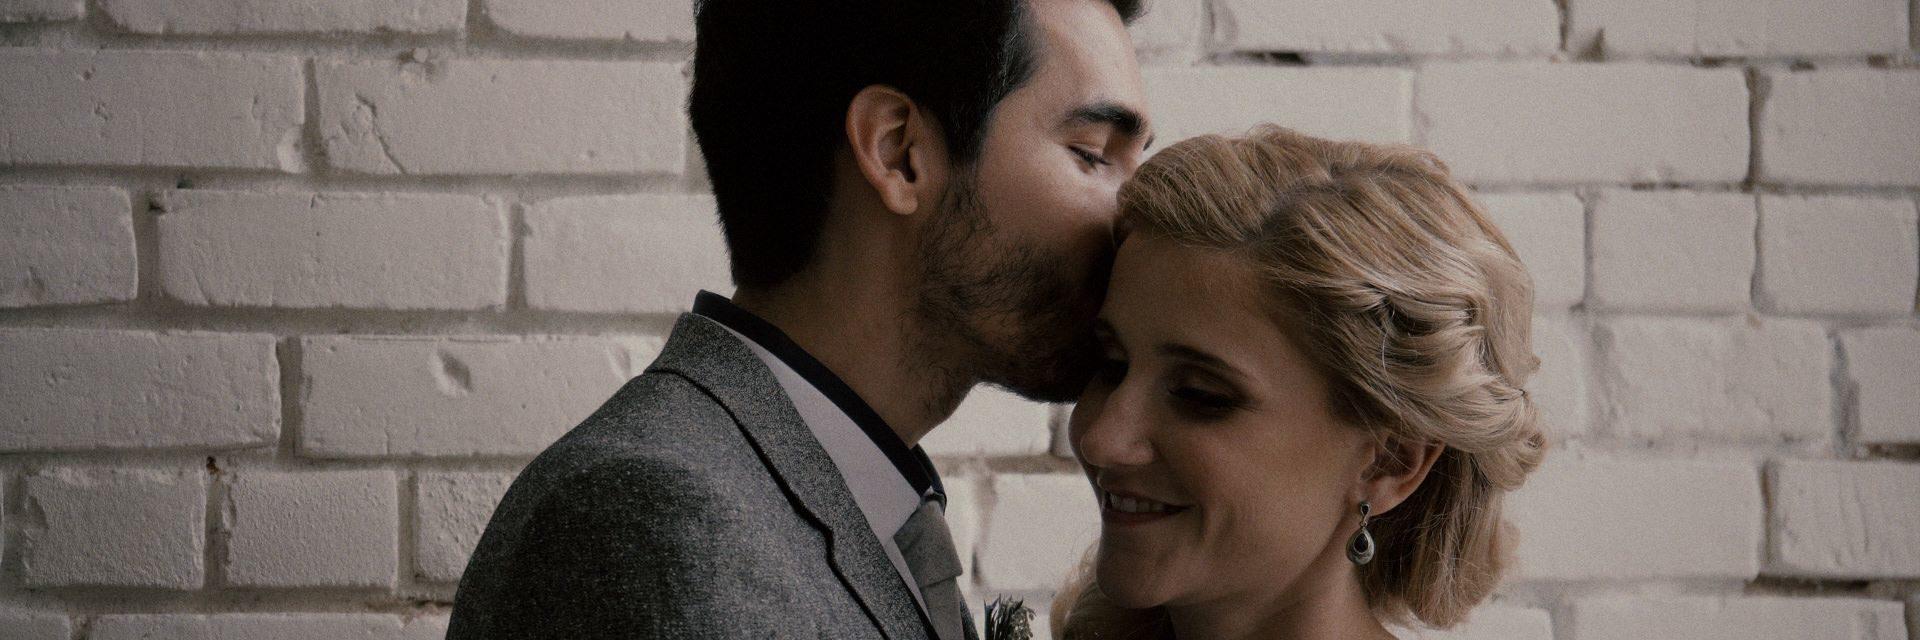 Helsinki-wedding-videographer-cinemate-films-03